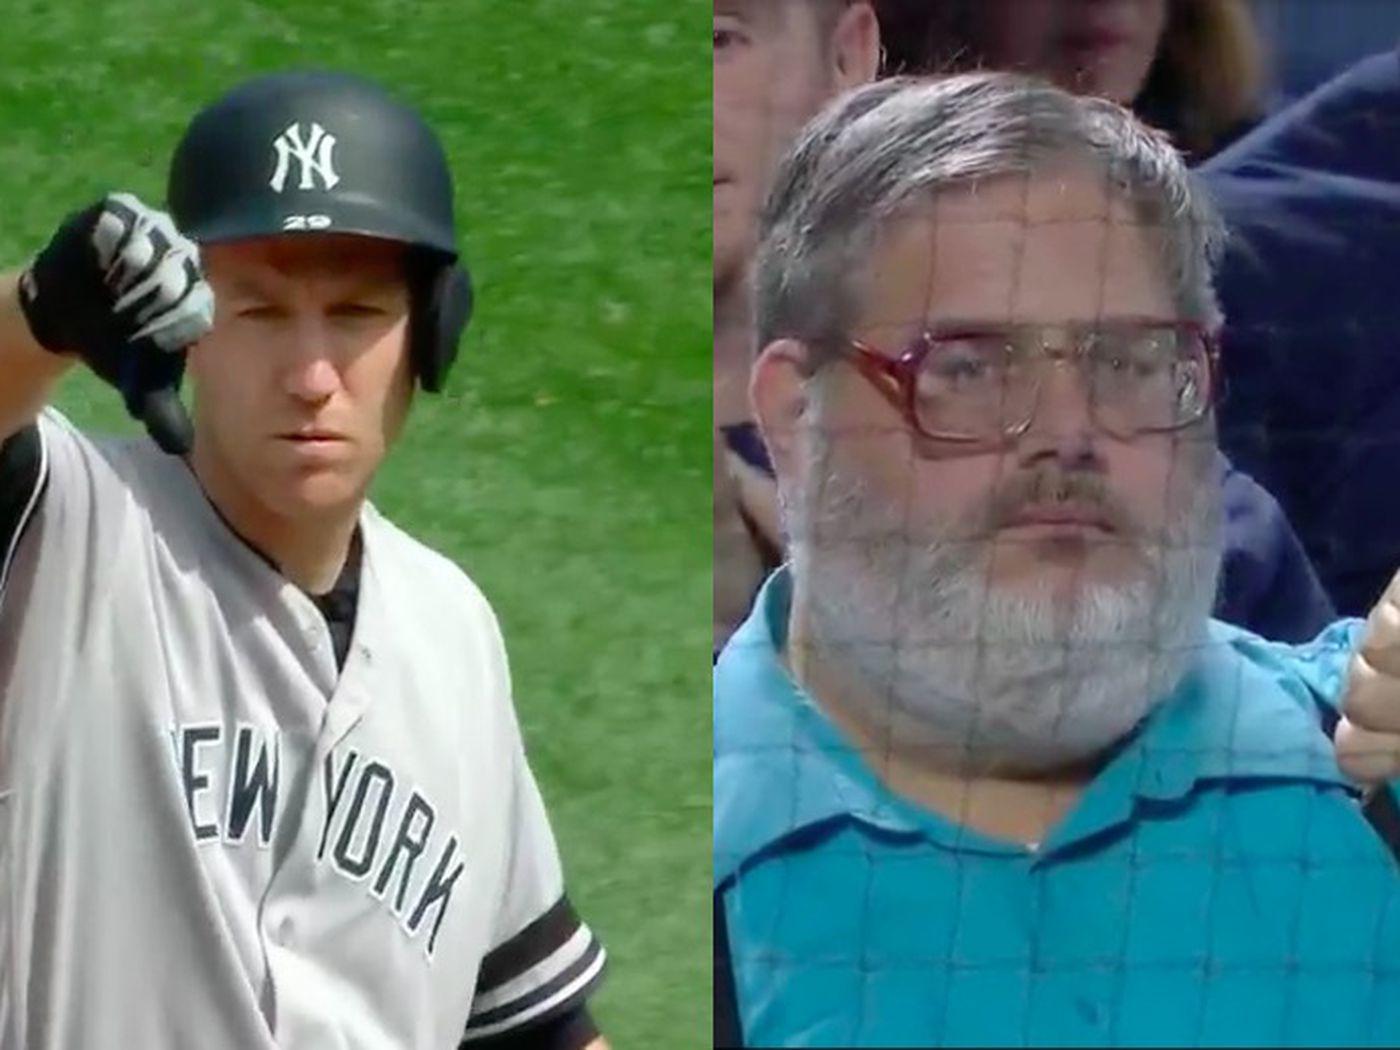 The Yankees' thumbs-down celebration has a hilarious backstory - SBNation.com